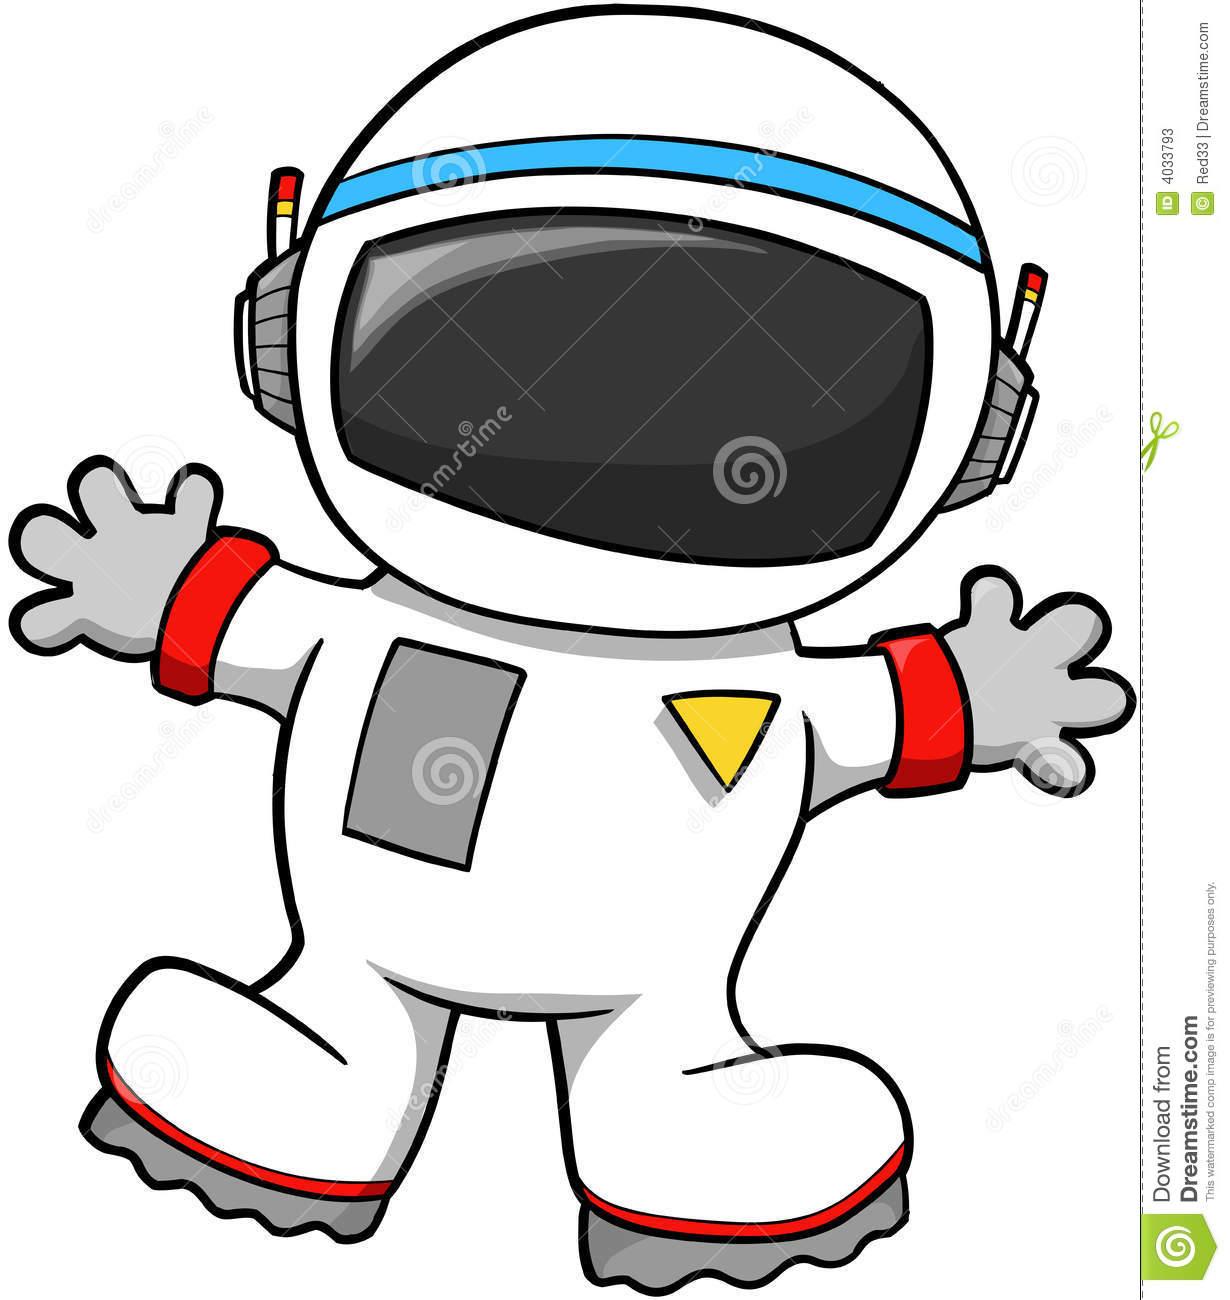 Clip art gallery astronaut. Clipart free download best